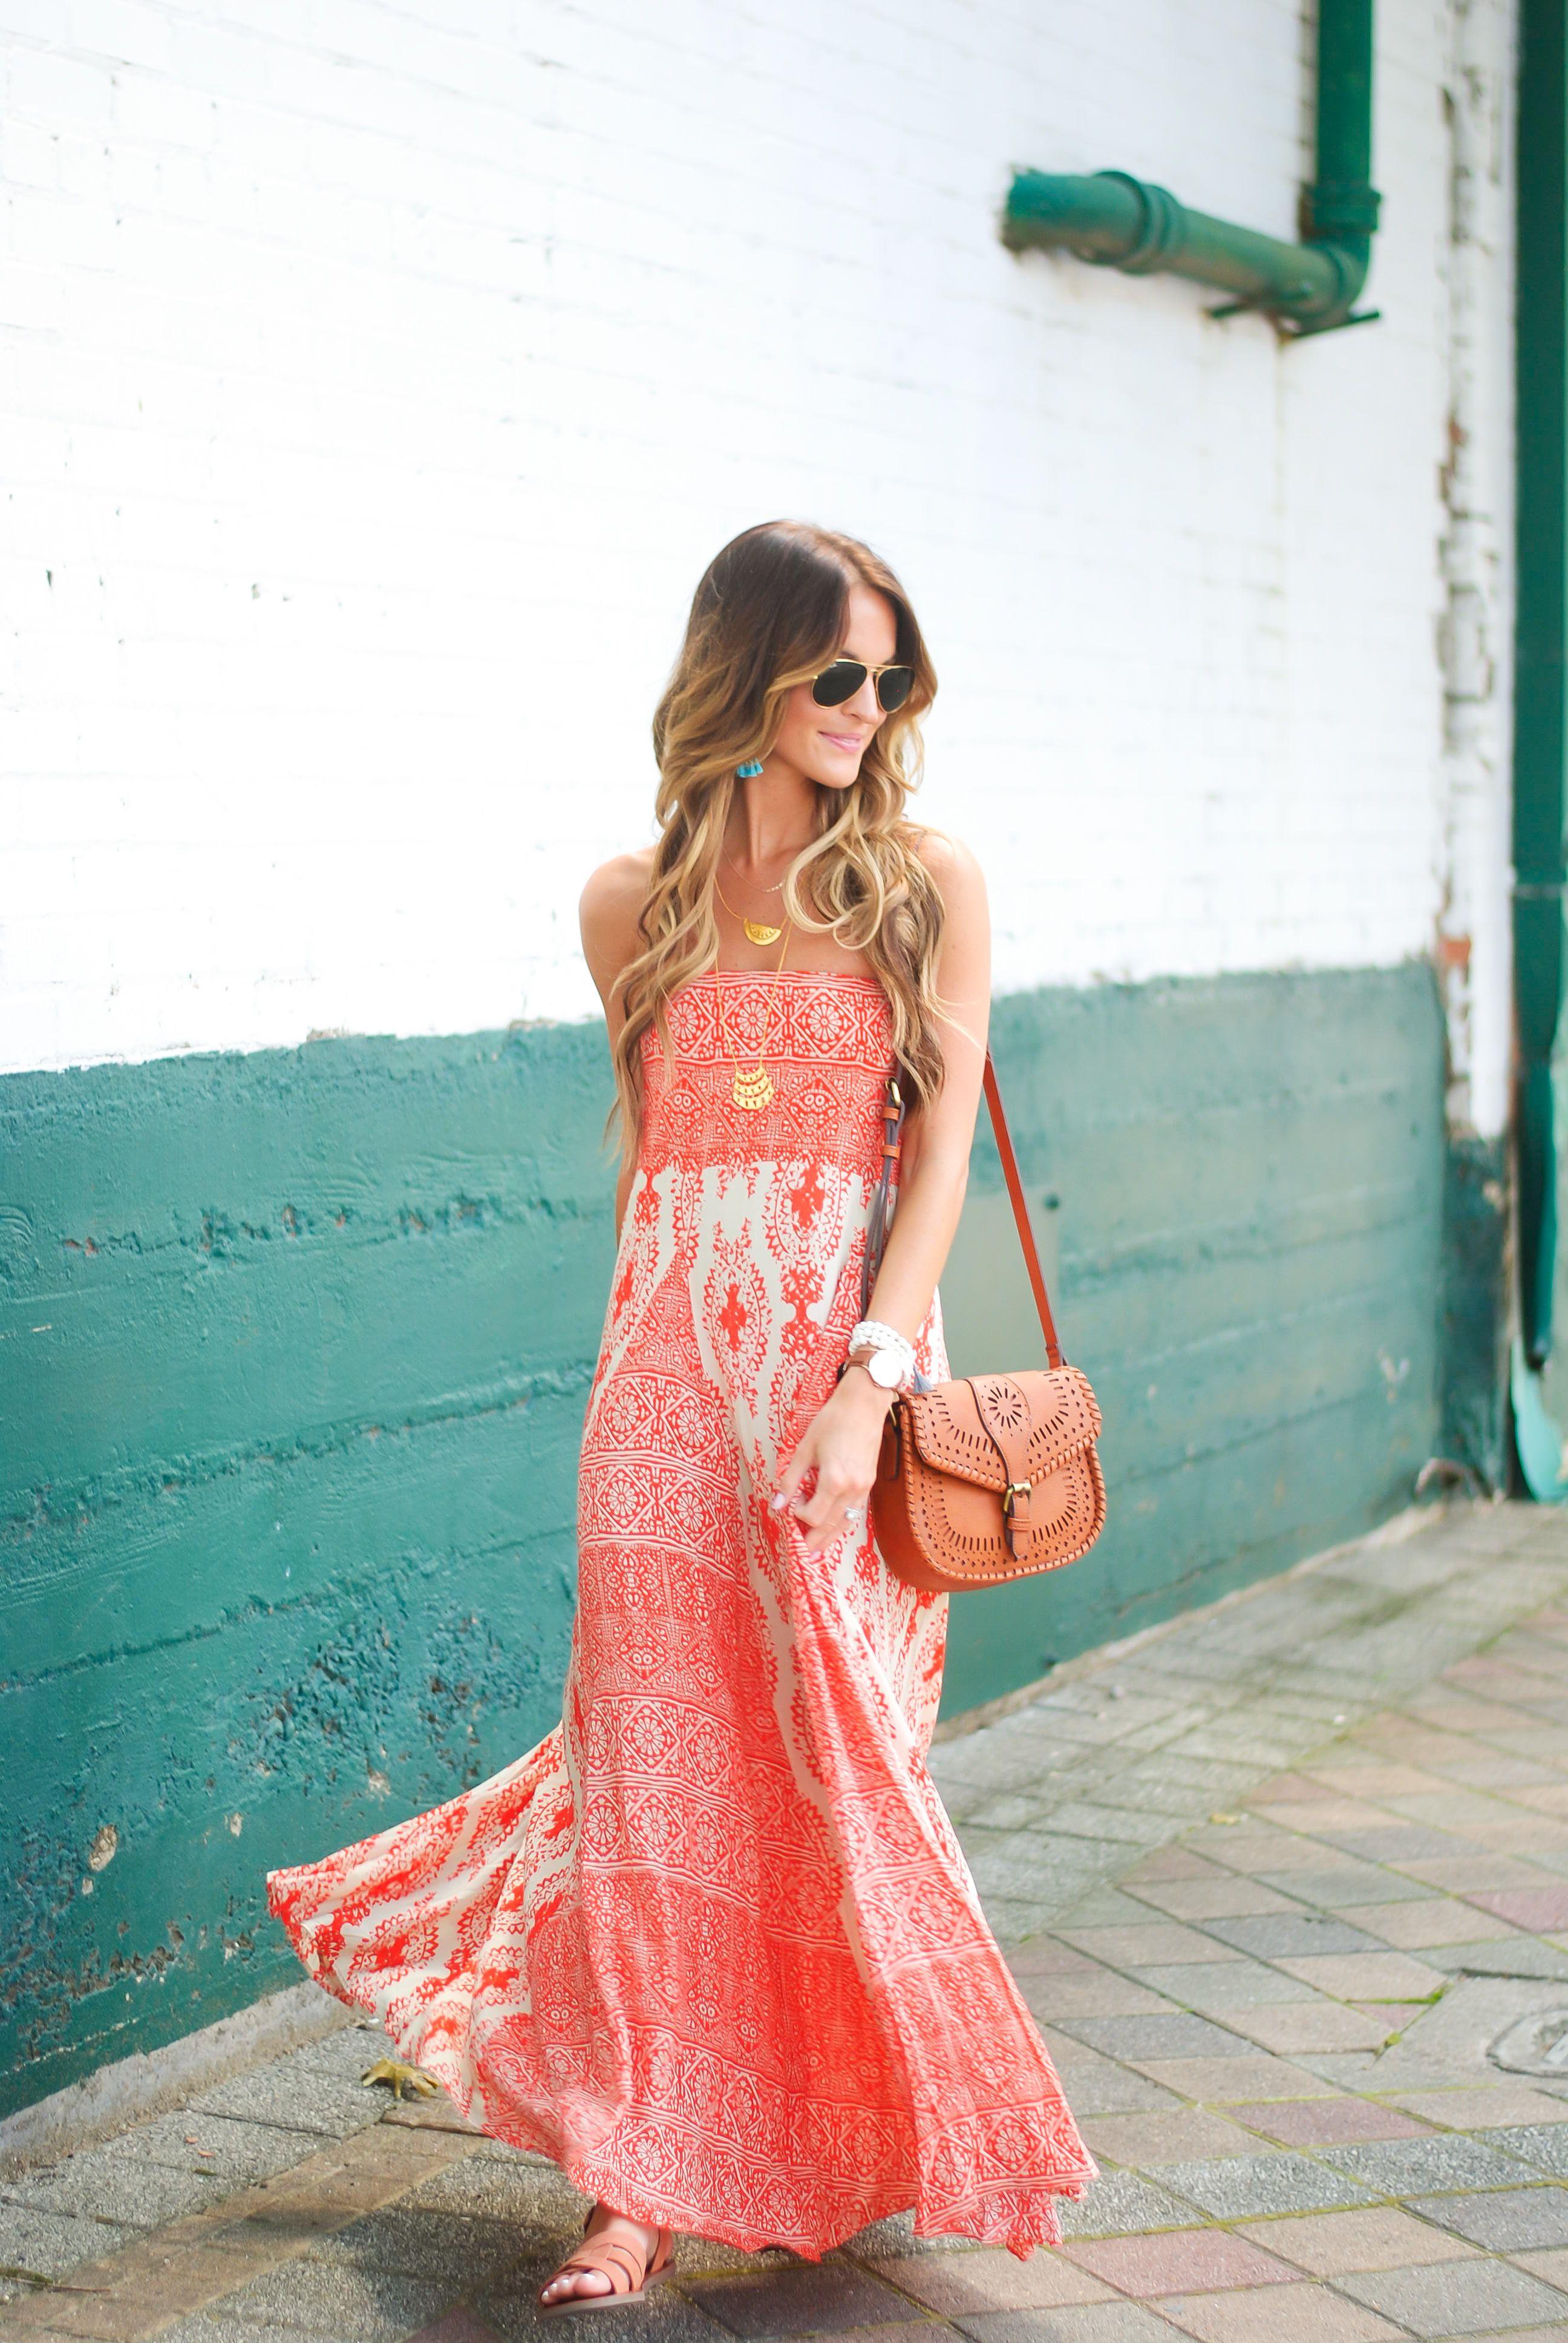 Boho Summer Maxi Dress Lauren Kay Sims Red Summer Dresses Summer Maxi Dress Boho Country Summer Dresses [ 3872 x 2592 Pixel ]